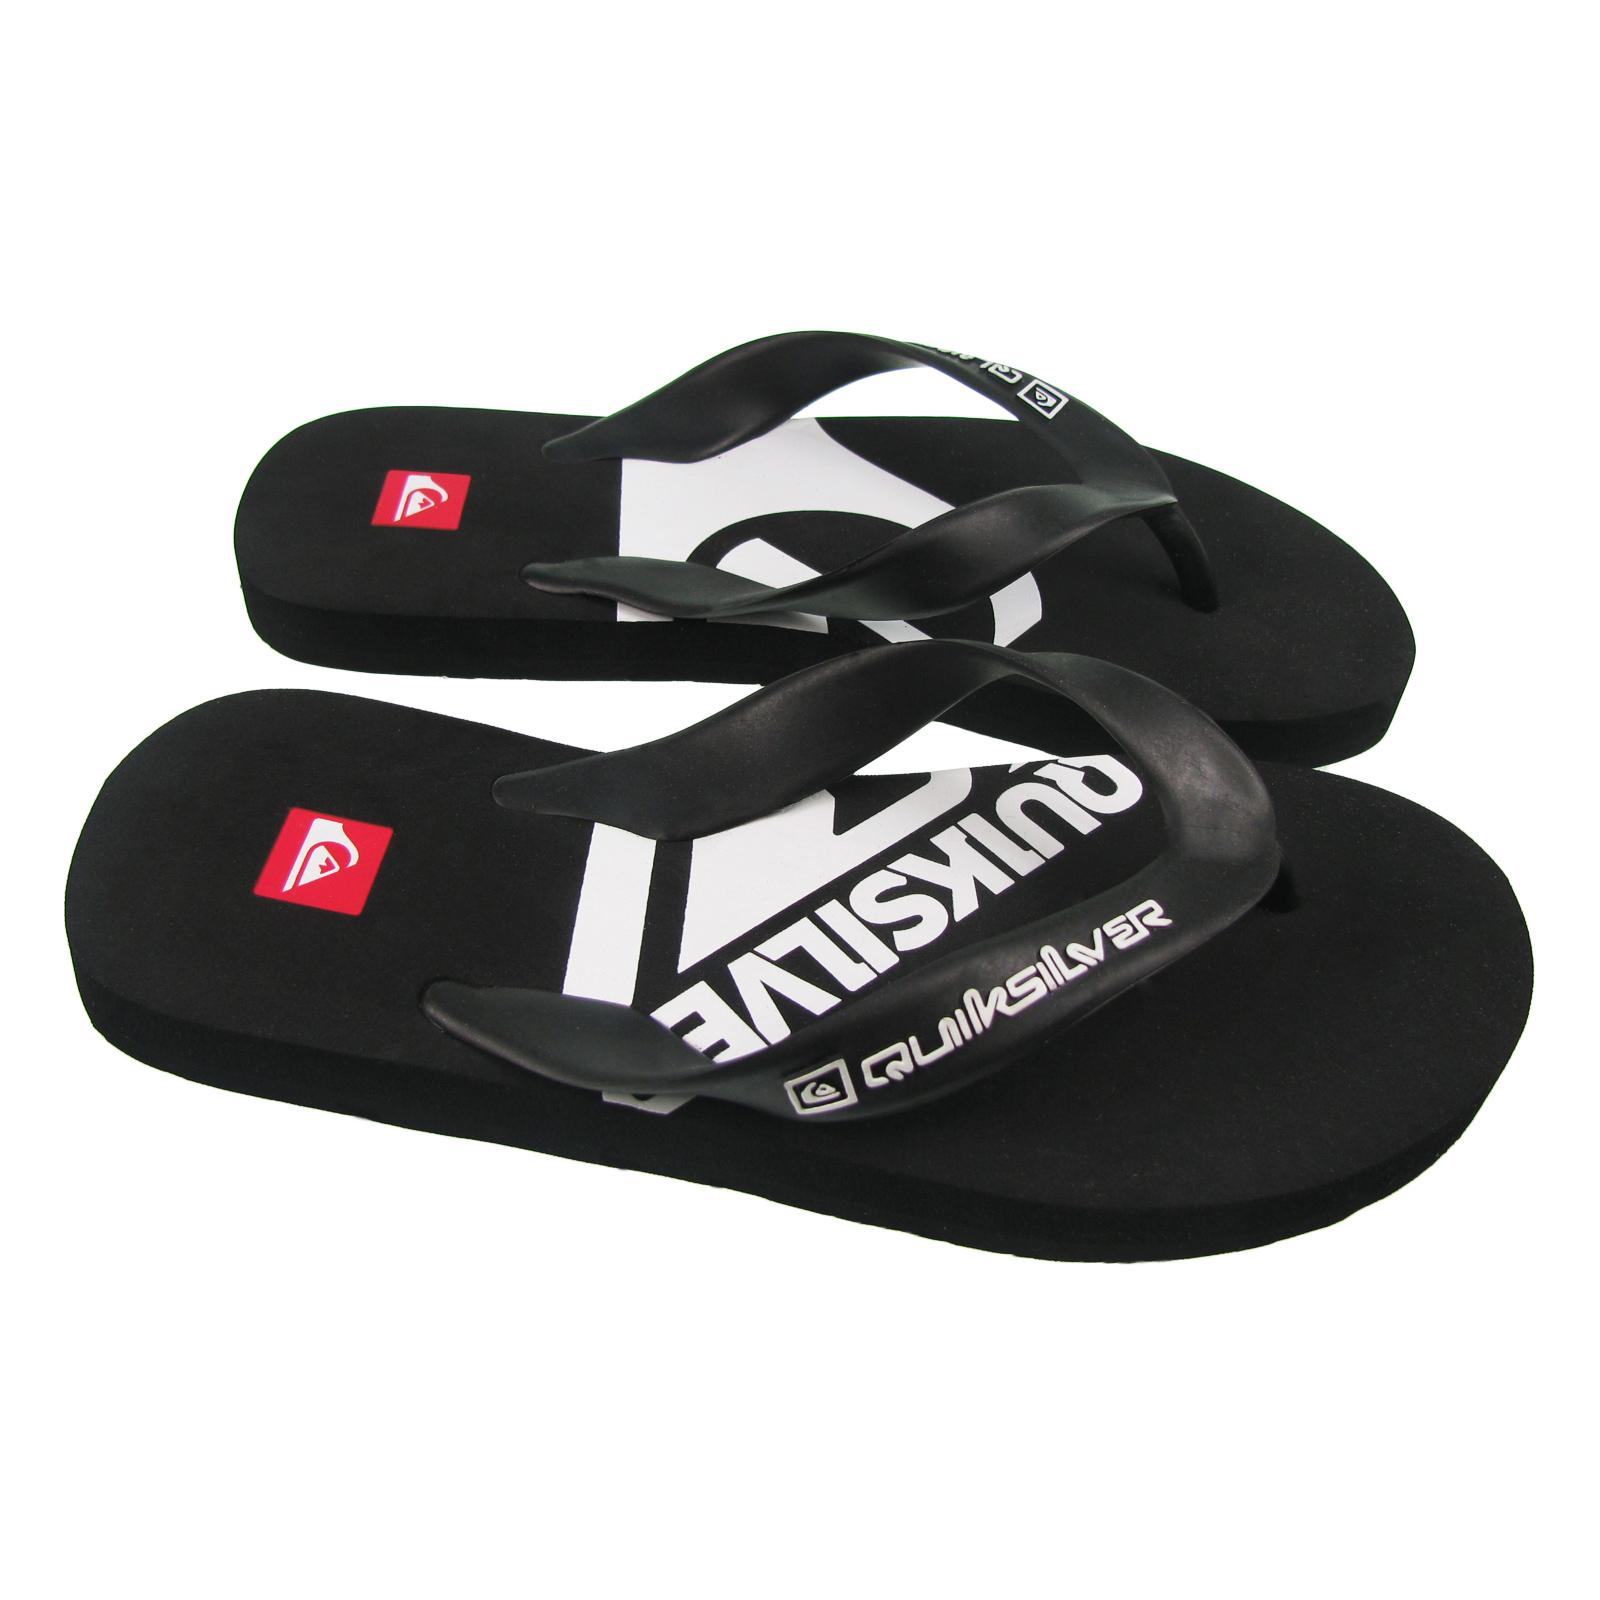 Black sandals ultima online - Thumbnail 1